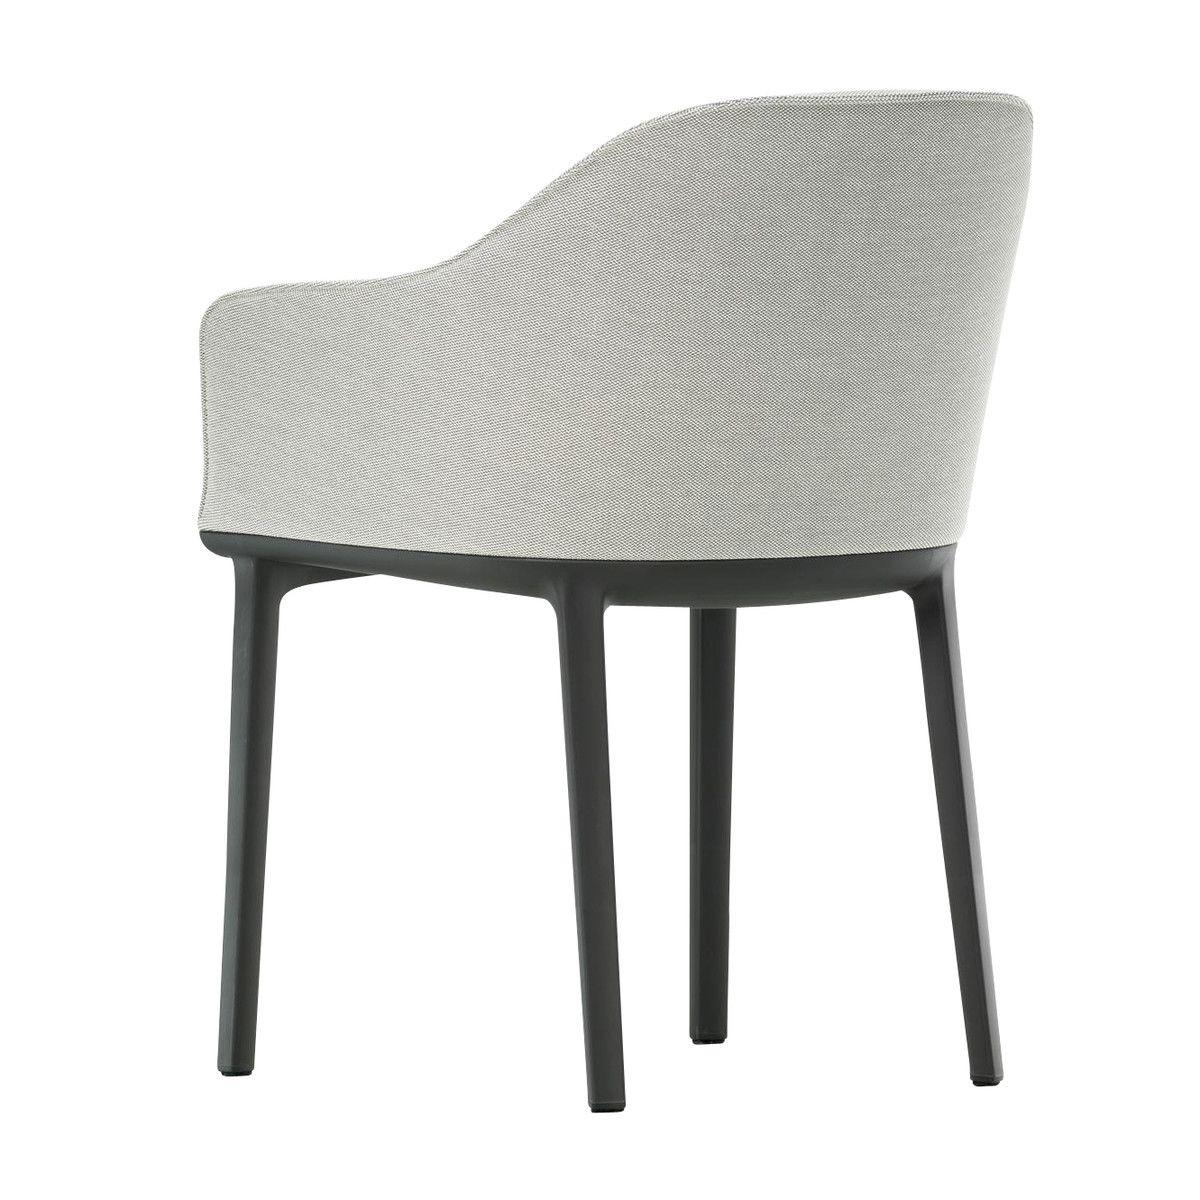 softshell chair vitra. Black Bedroom Furniture Sets. Home Design Ideas